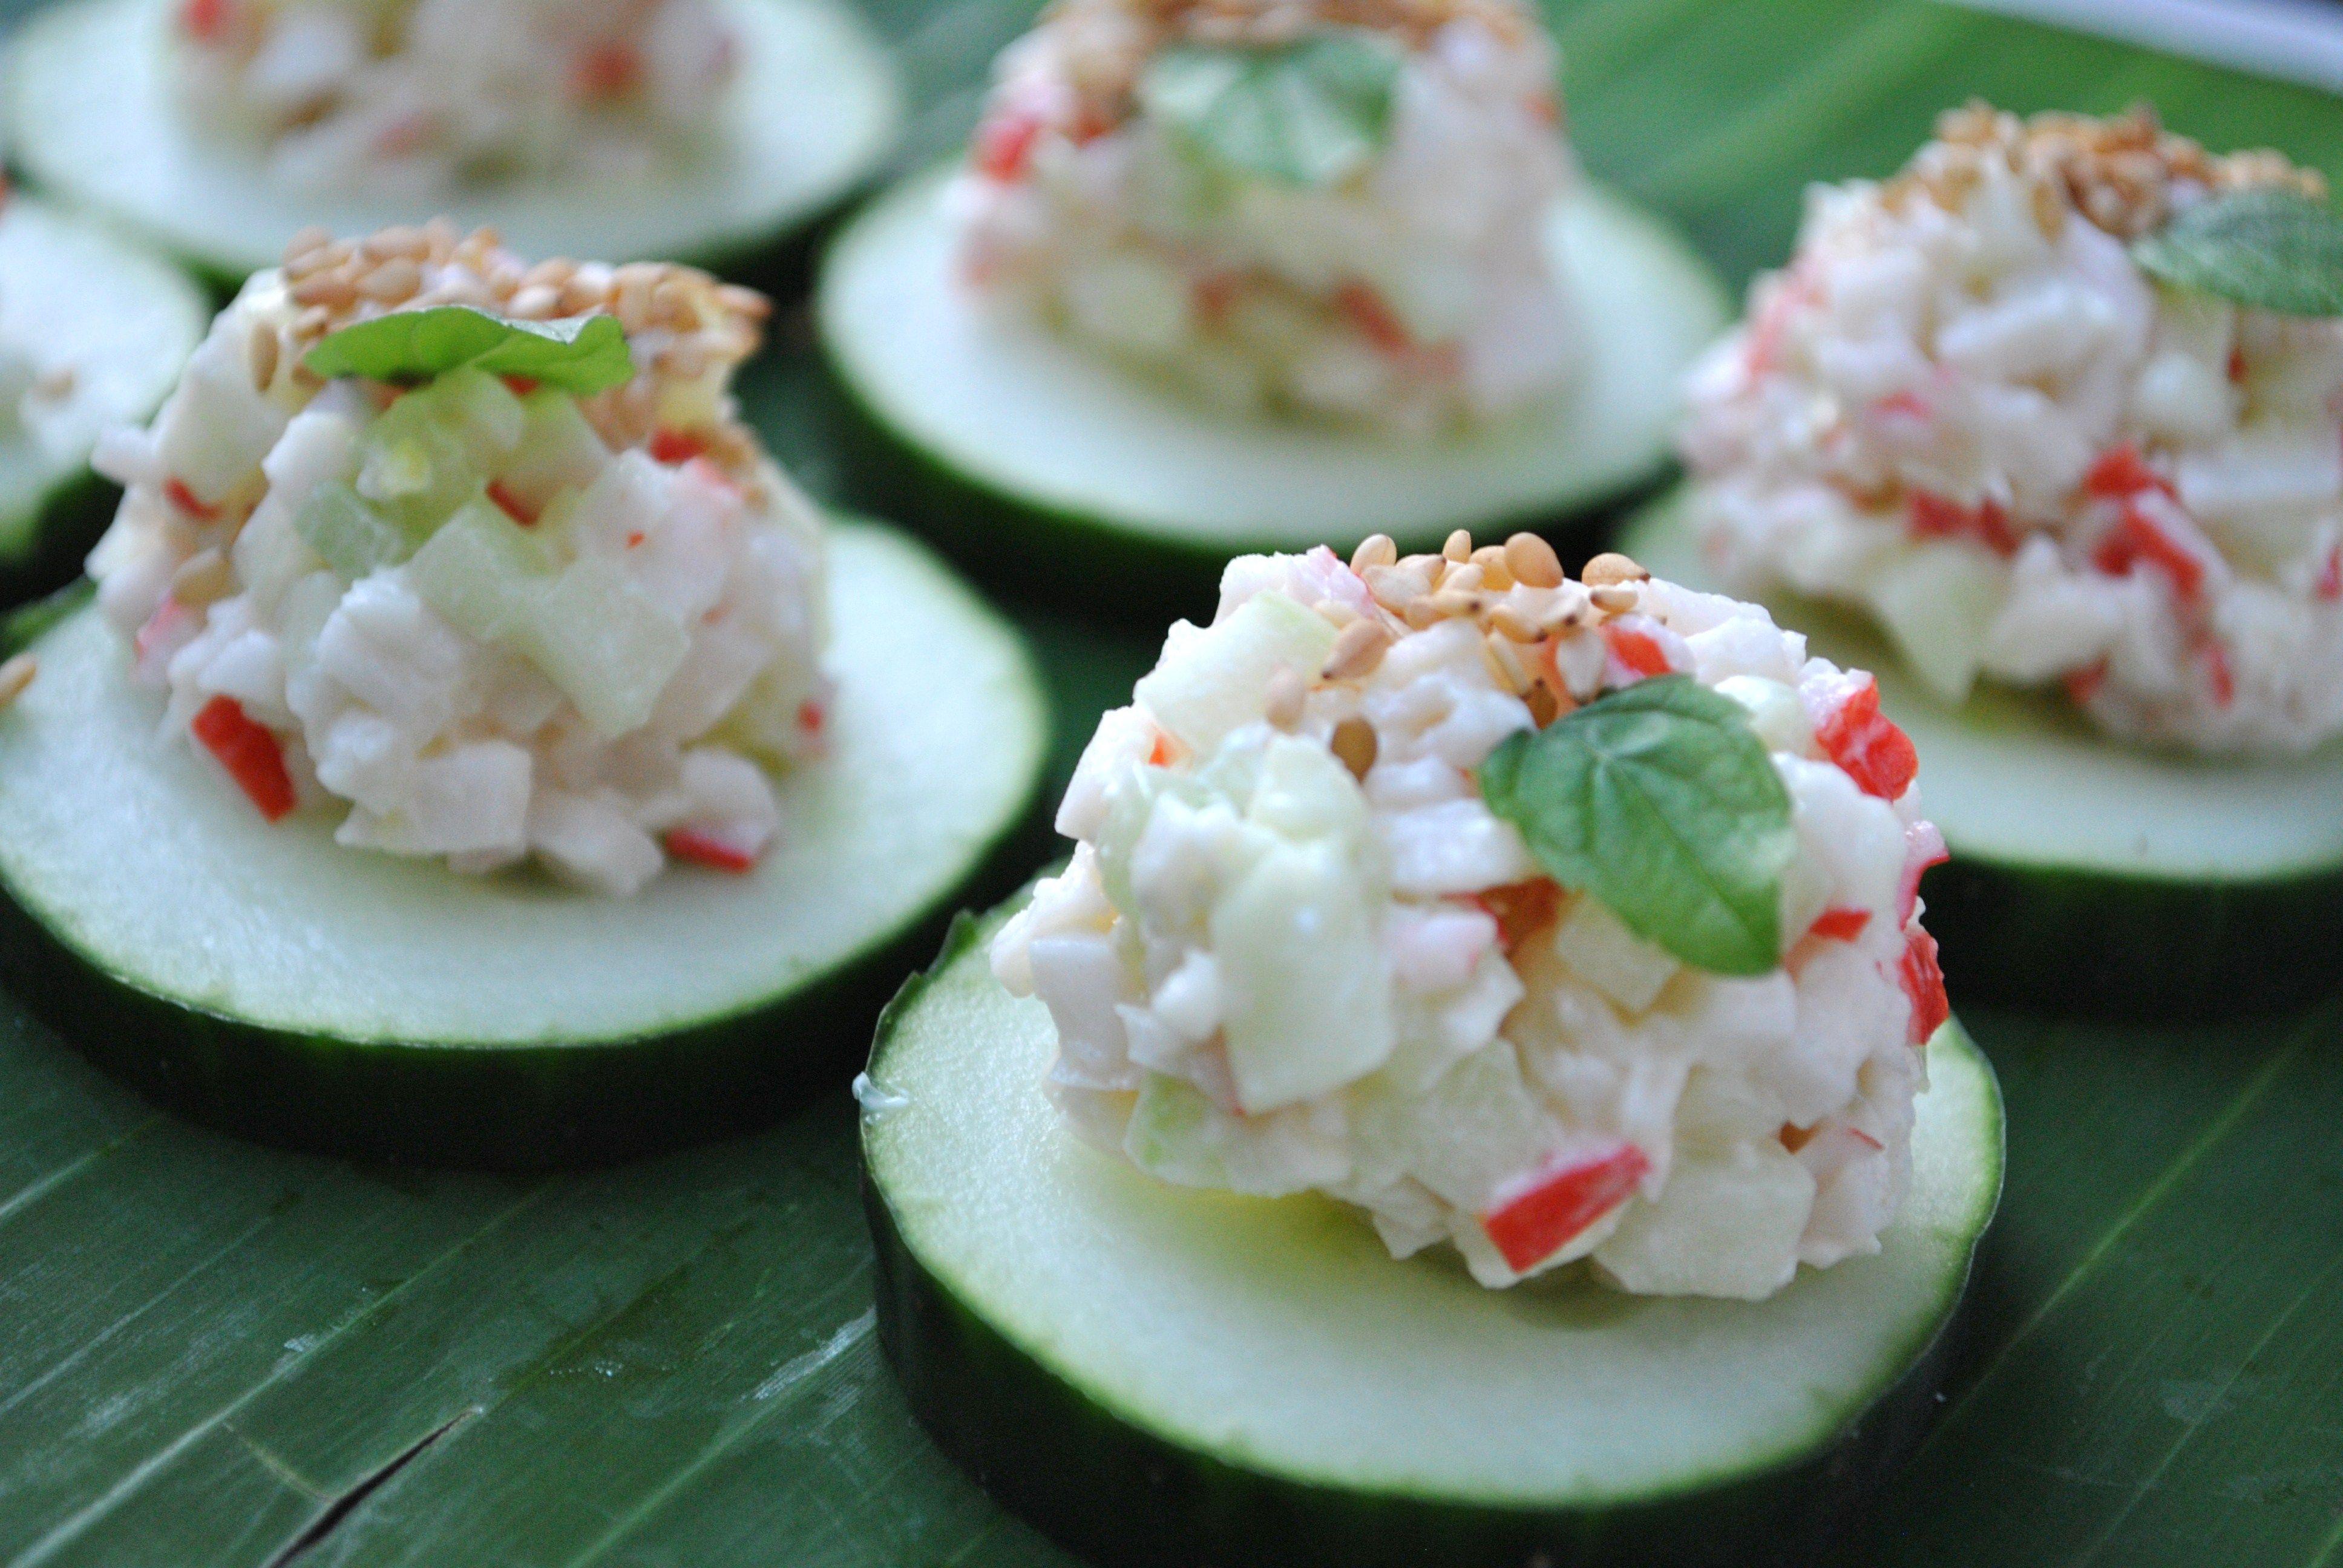 menu entr es salade surimi laver quelques feuilles de. Black Bedroom Furniture Sets. Home Design Ideas